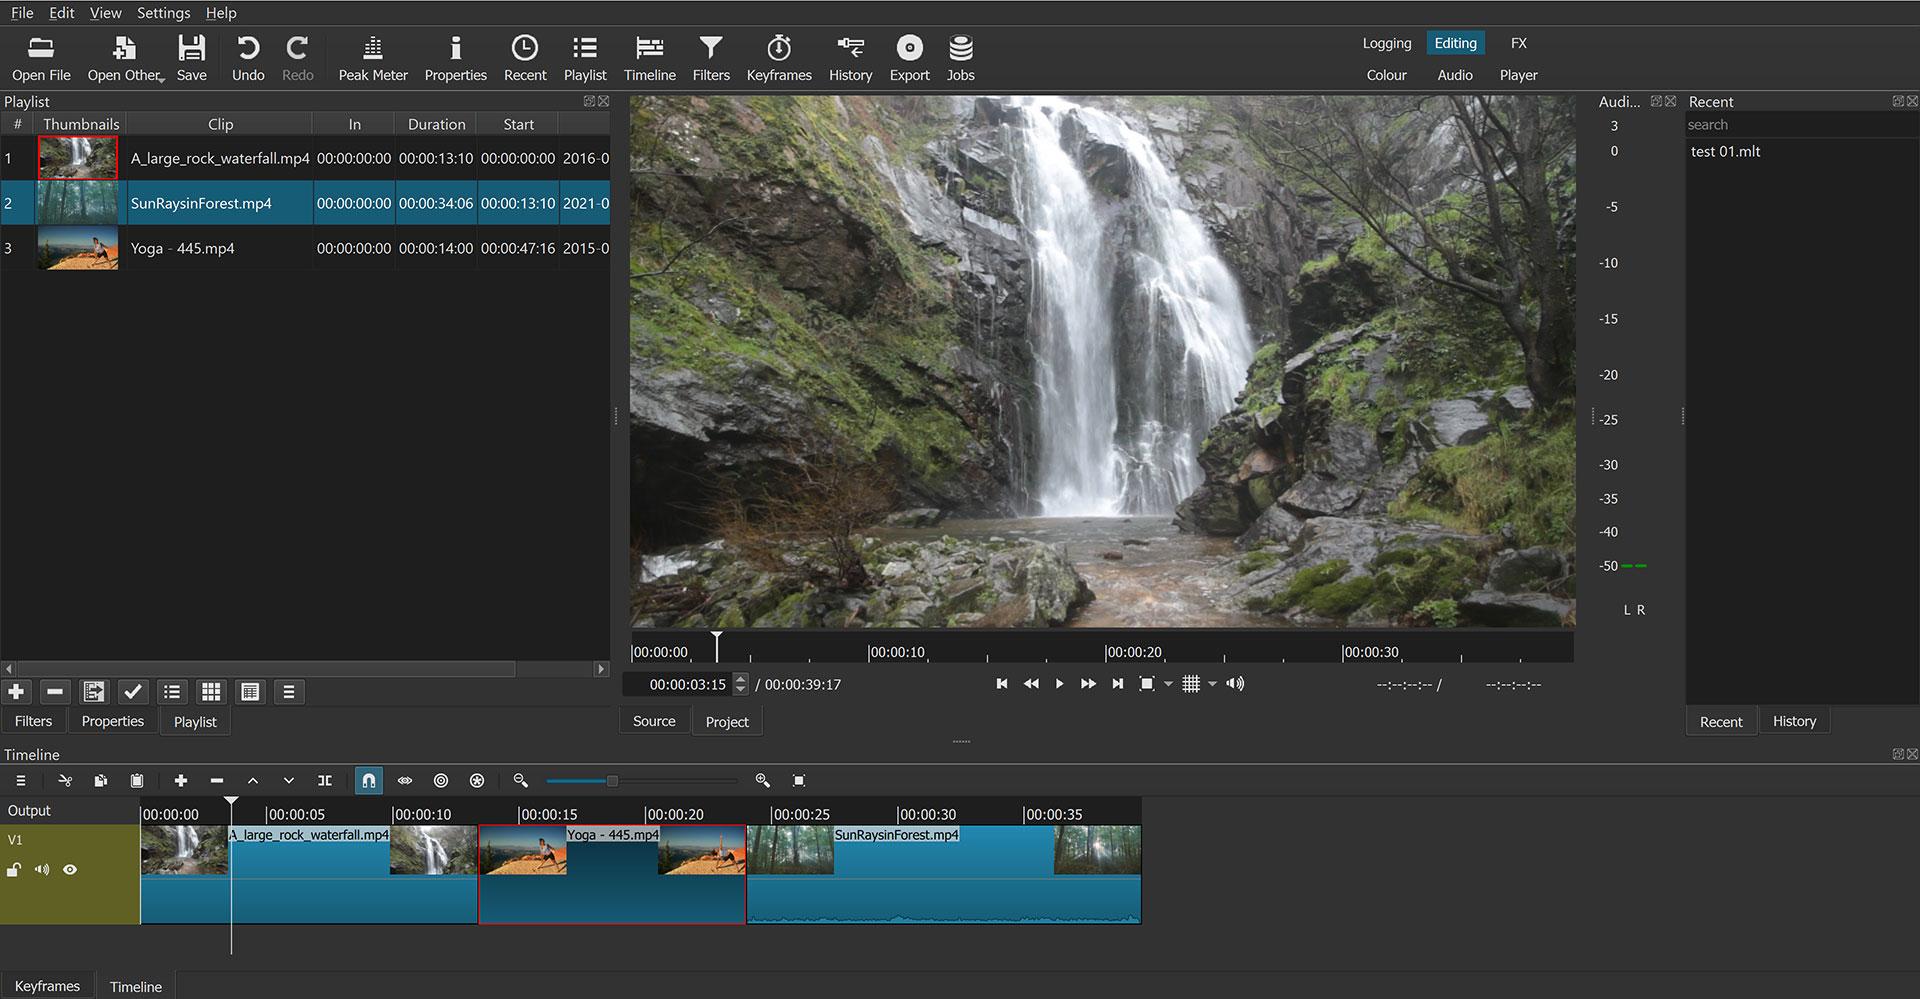 Shotcut program interface in the Editing mode layout